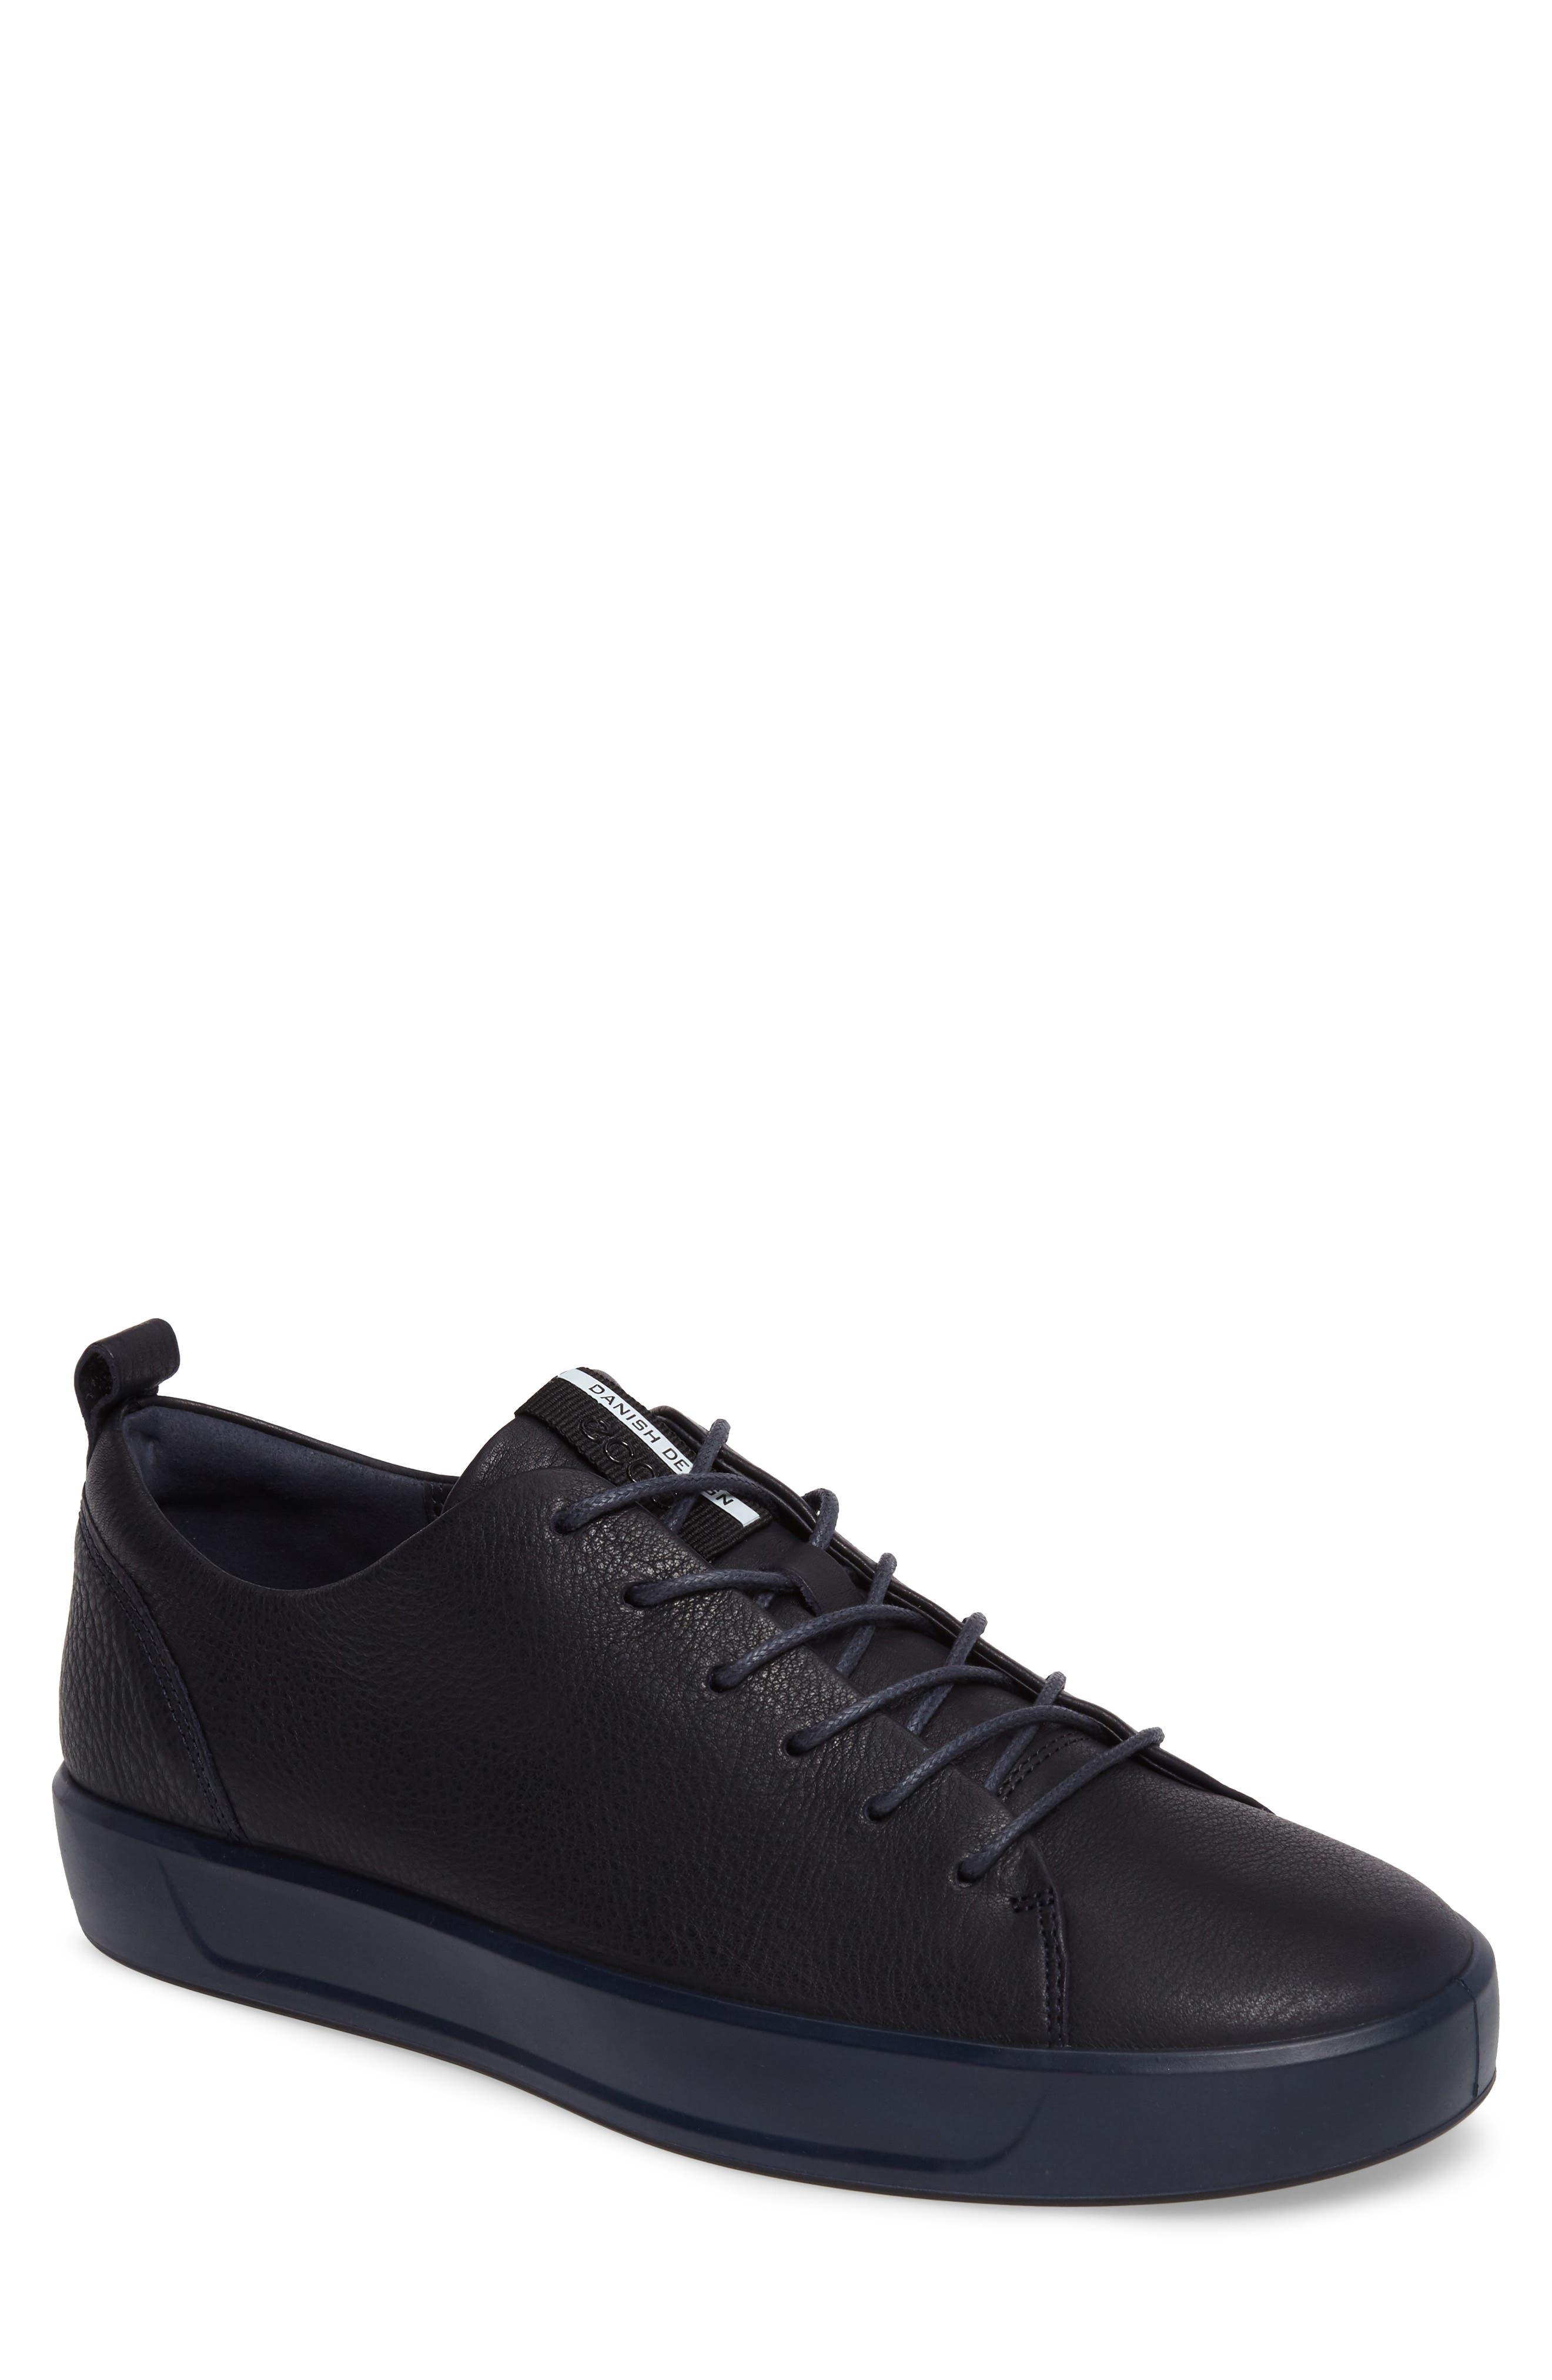 Main Image - ECCO Soft 8 Sneaker (Men)